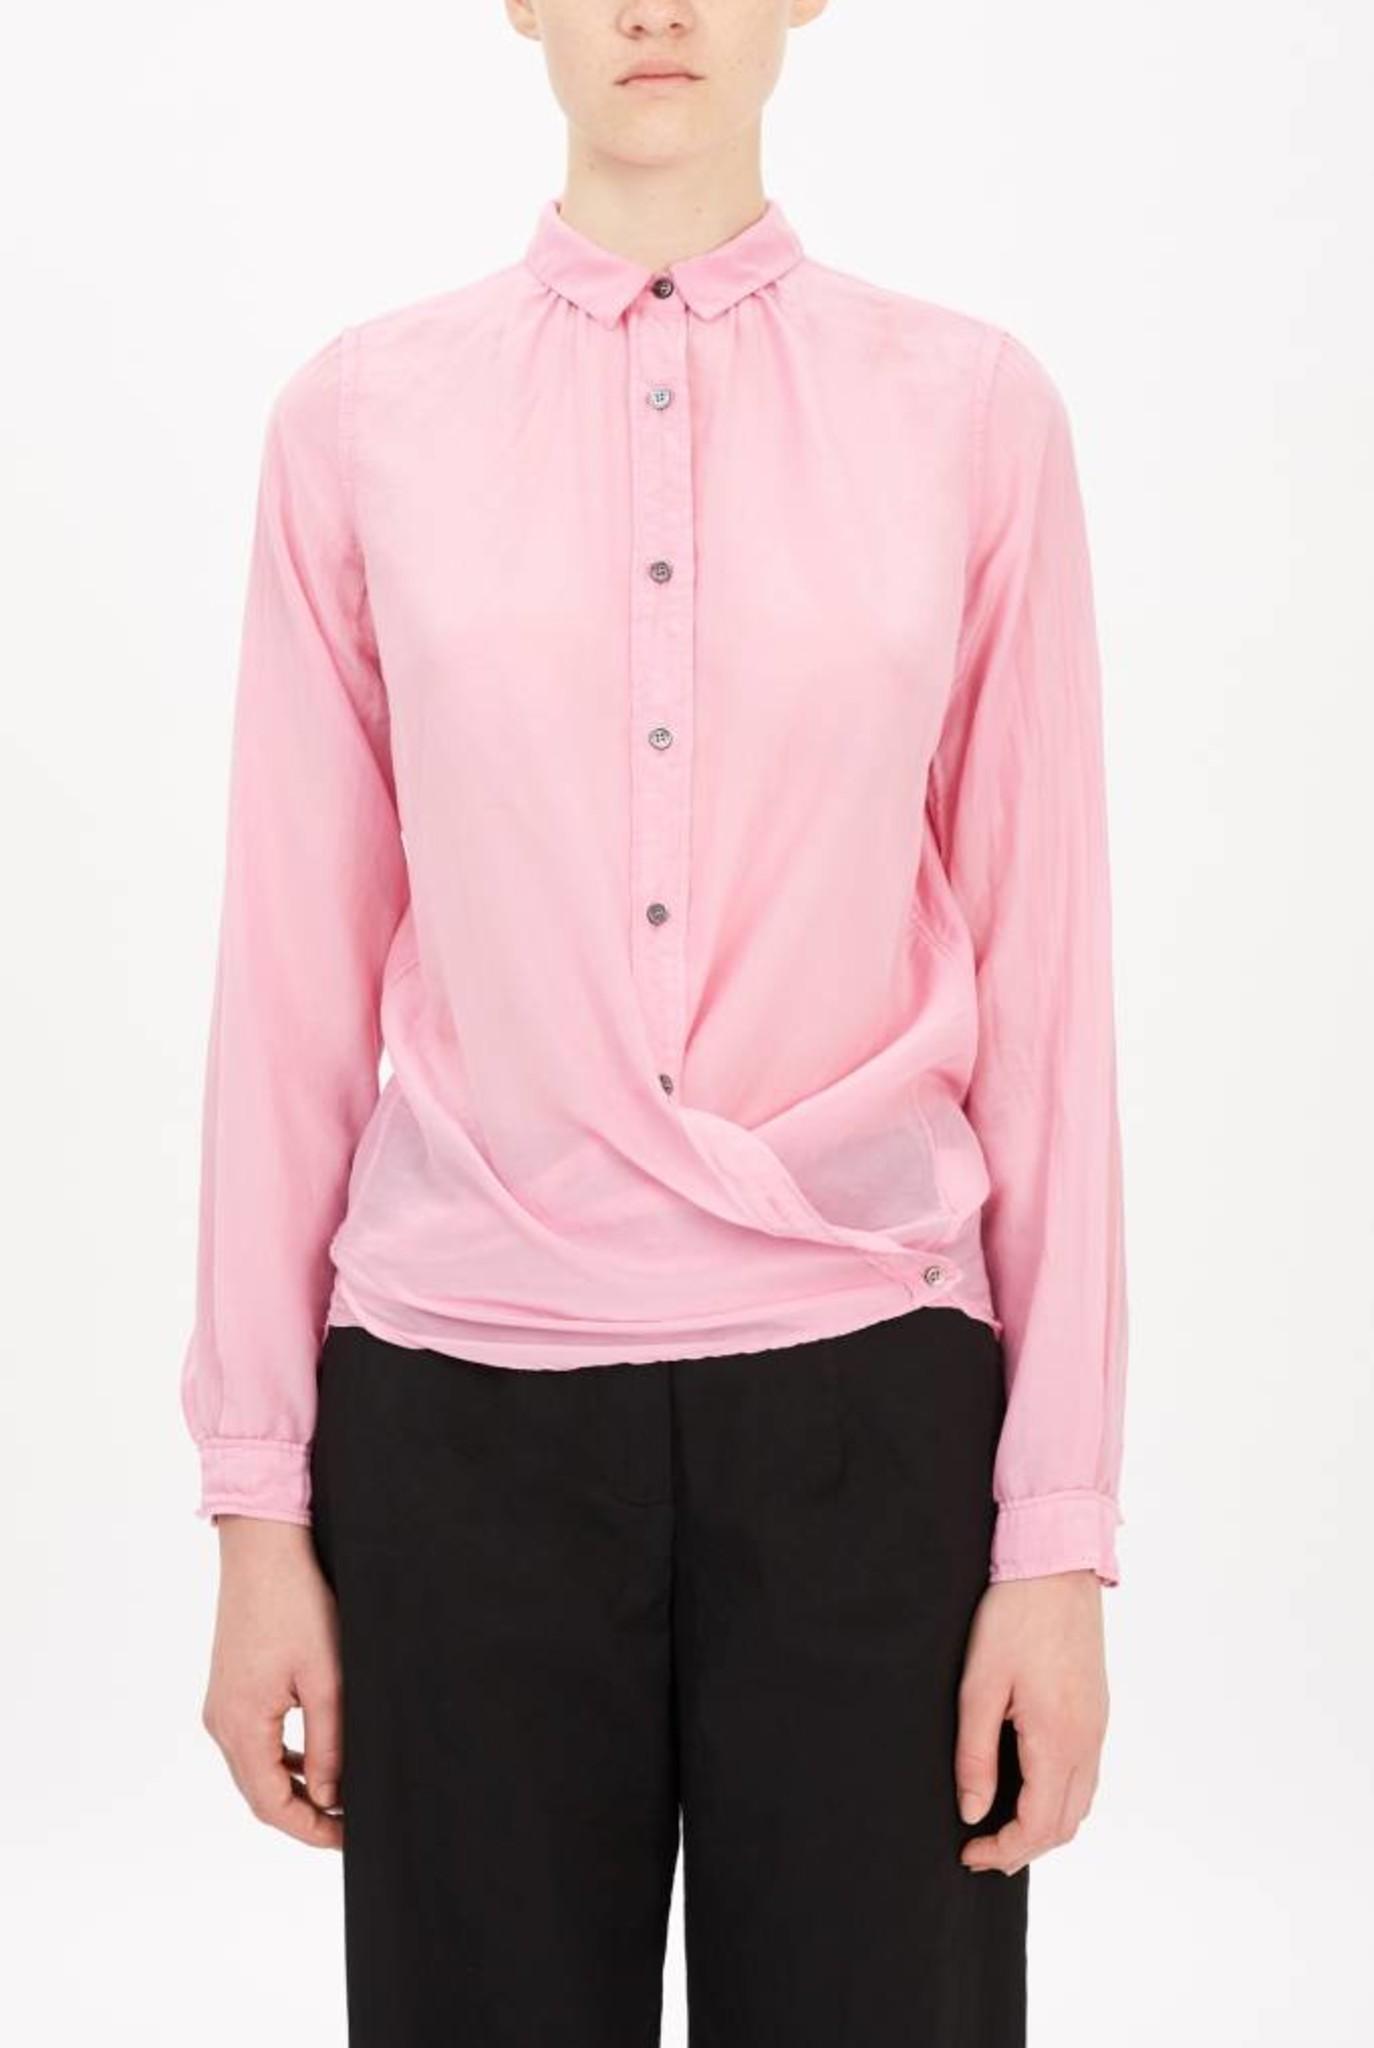 thin blouse pink